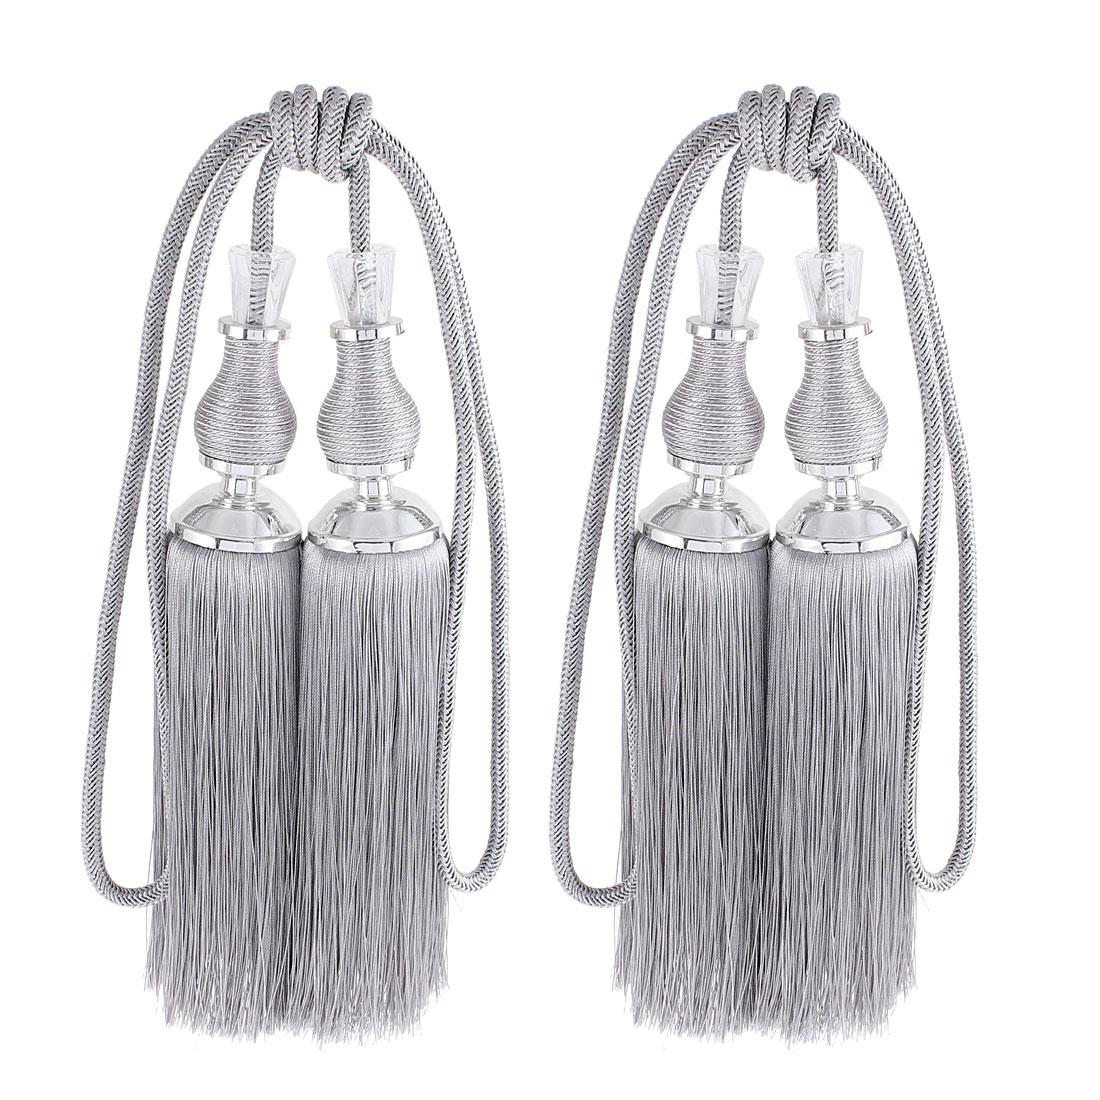 Drapery Curtain Dual Heads Tassel Tiebacks Gray Silver Tone 2Pcs